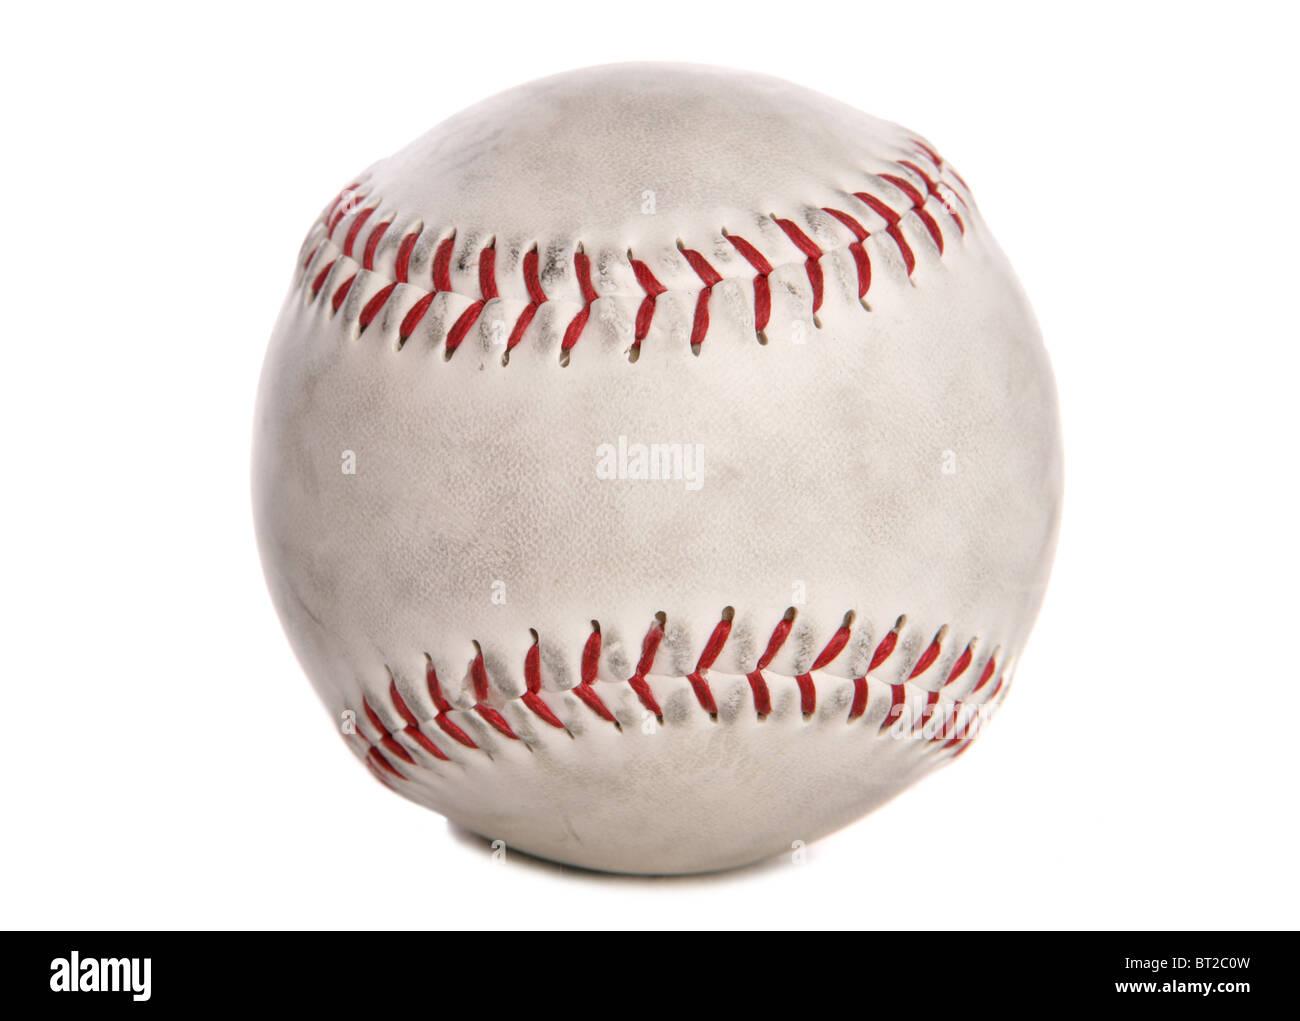 Used white baseball studio cutout - Stock Image